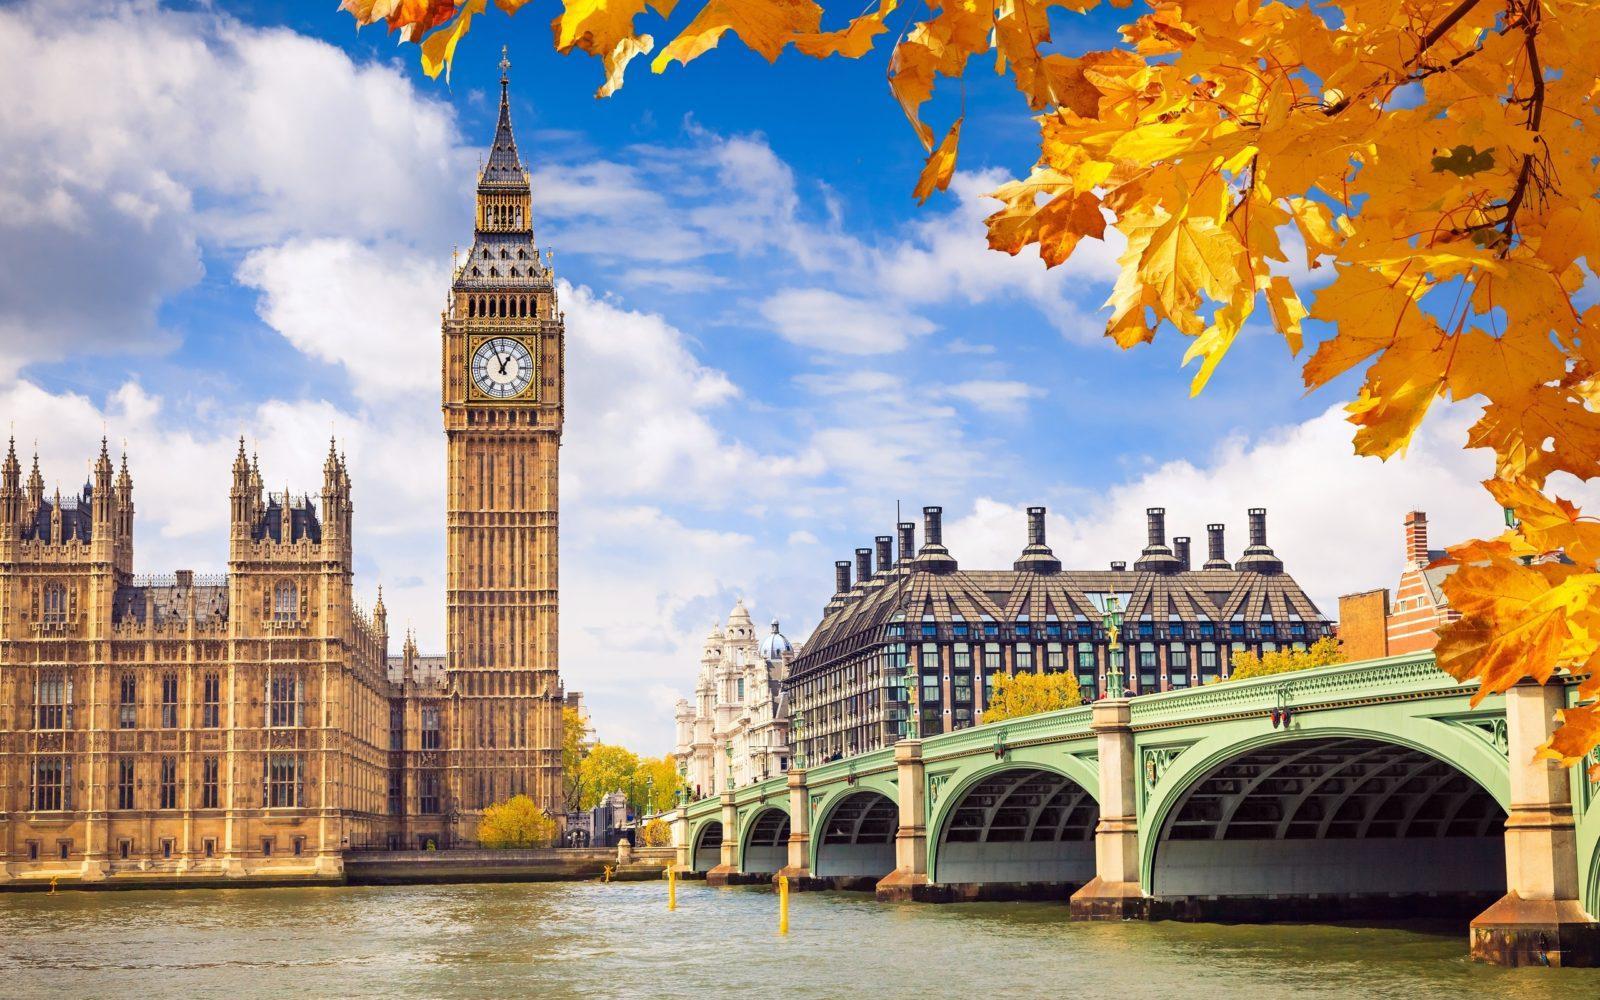 autumn britain england great london palace westminster - ავიაბილეთები ლონდონი